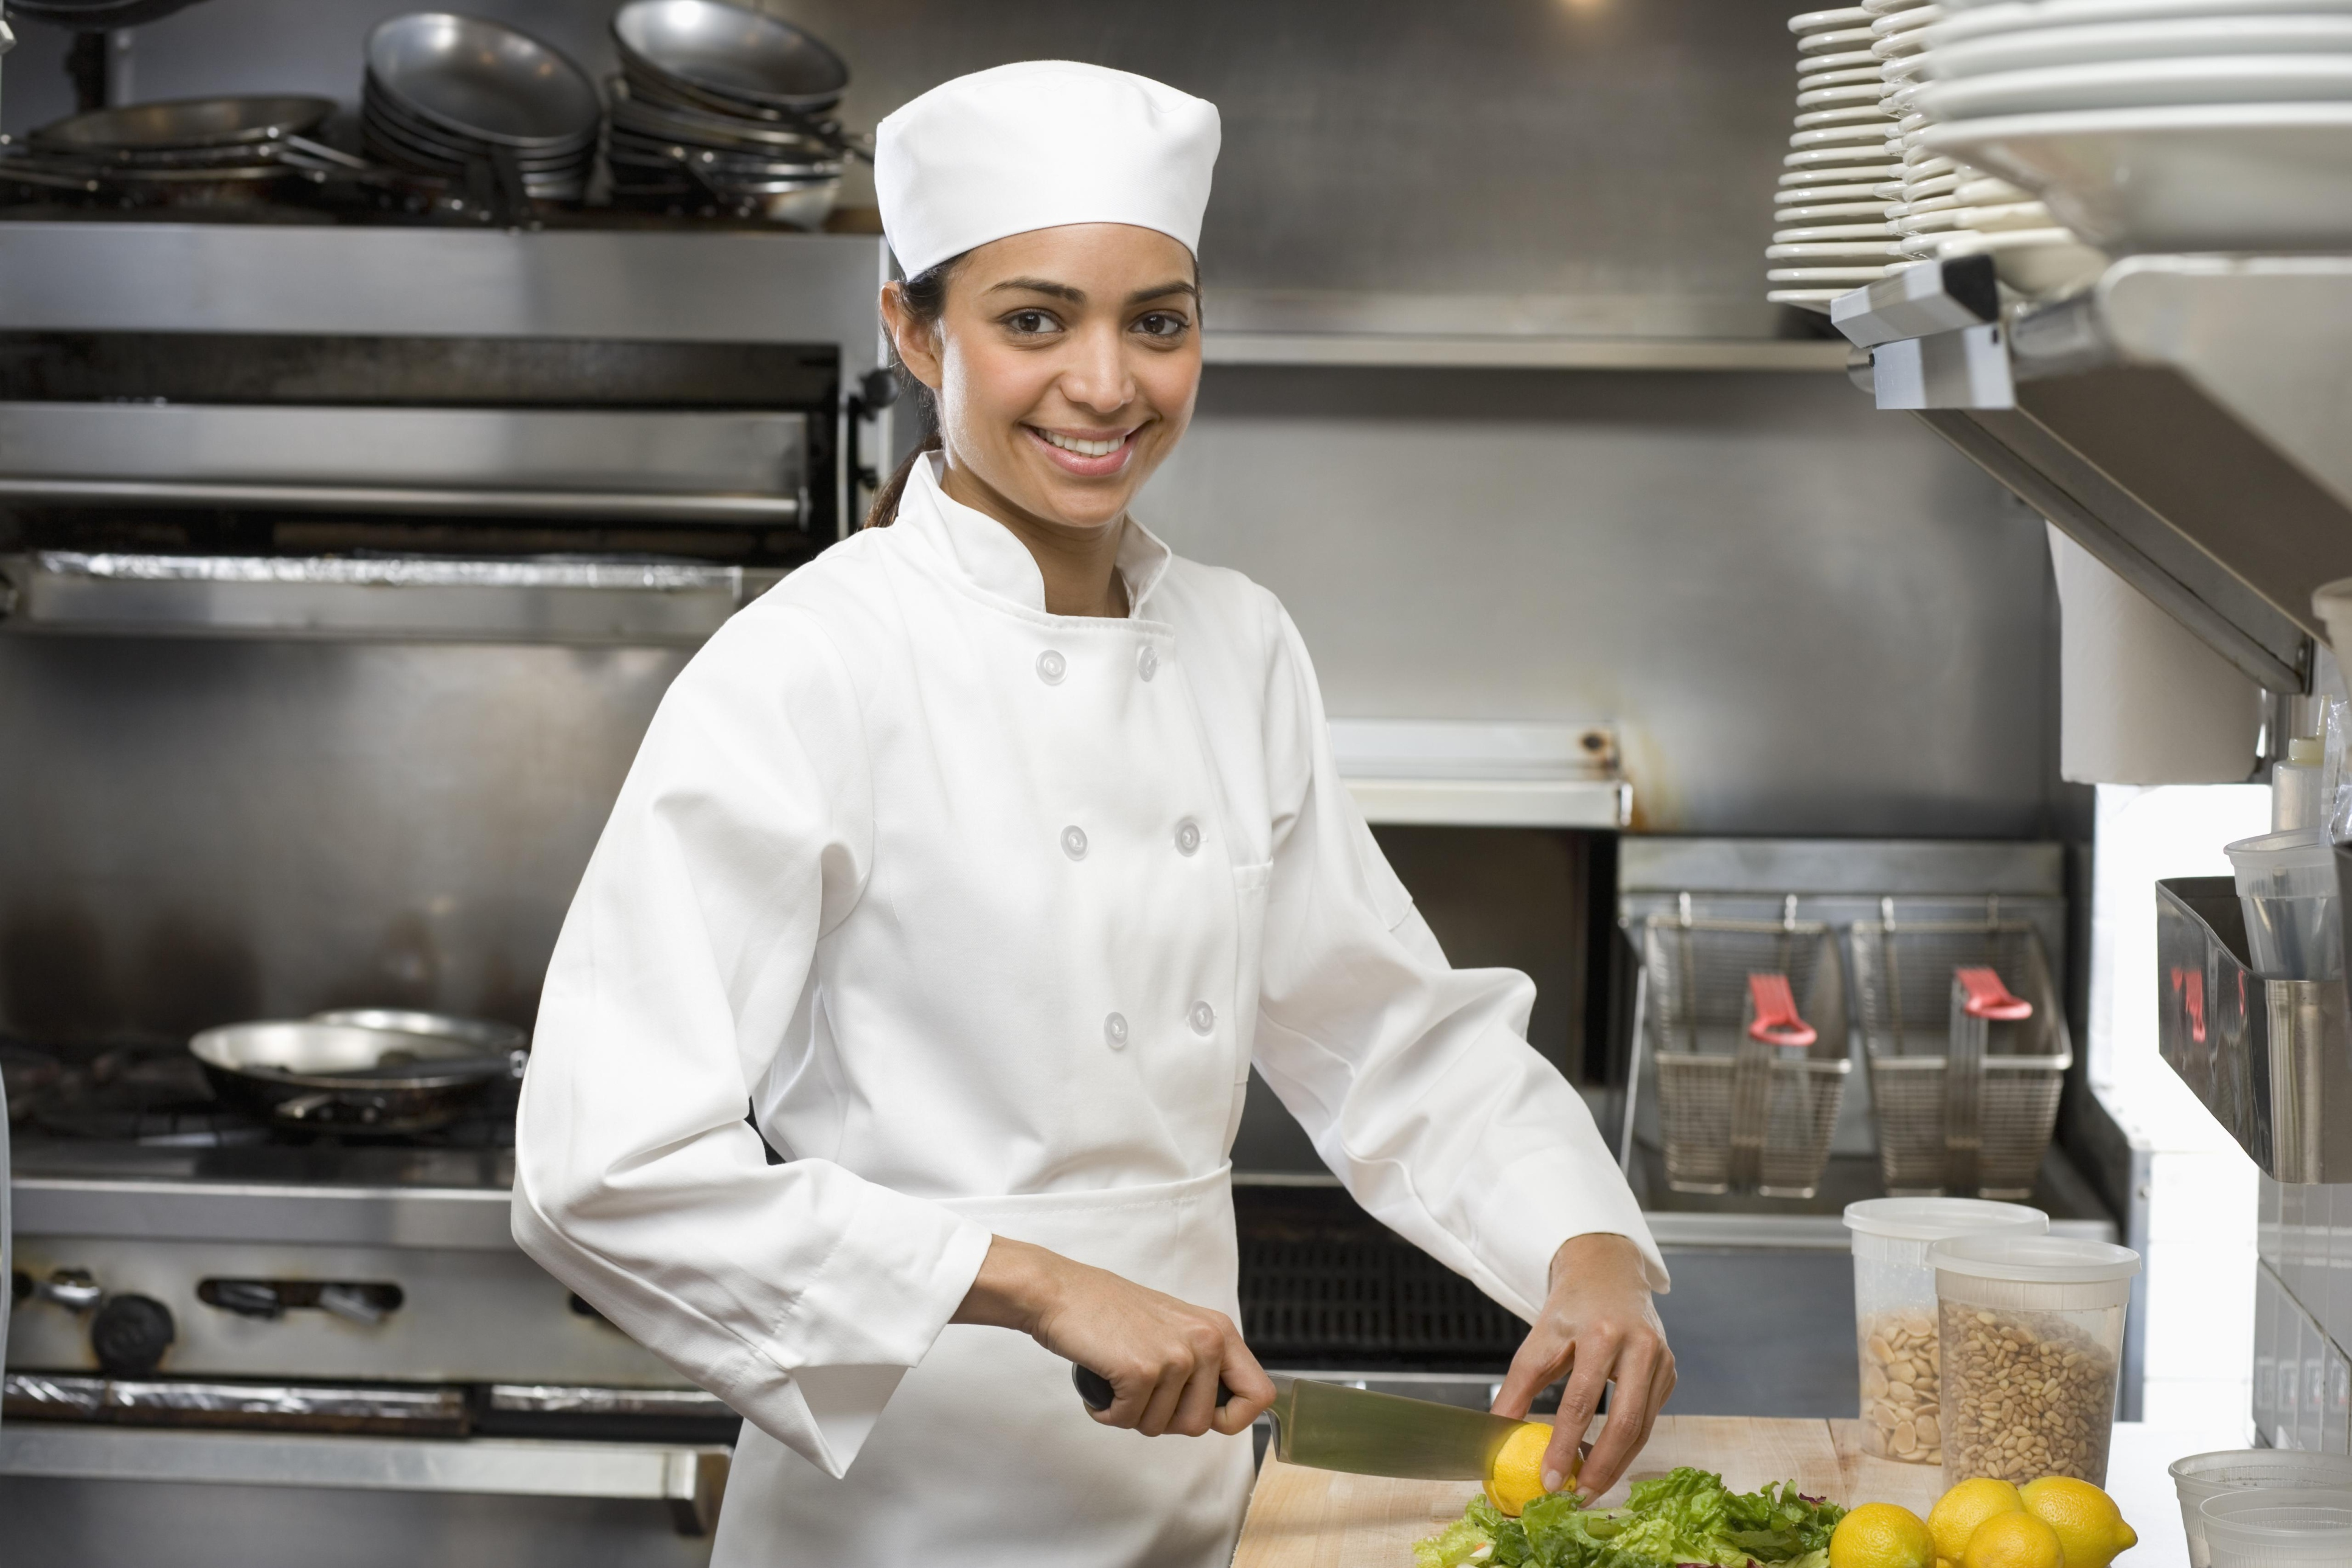 kitchen chief unique items female chef in restaurant grewal levy marketing news waist length